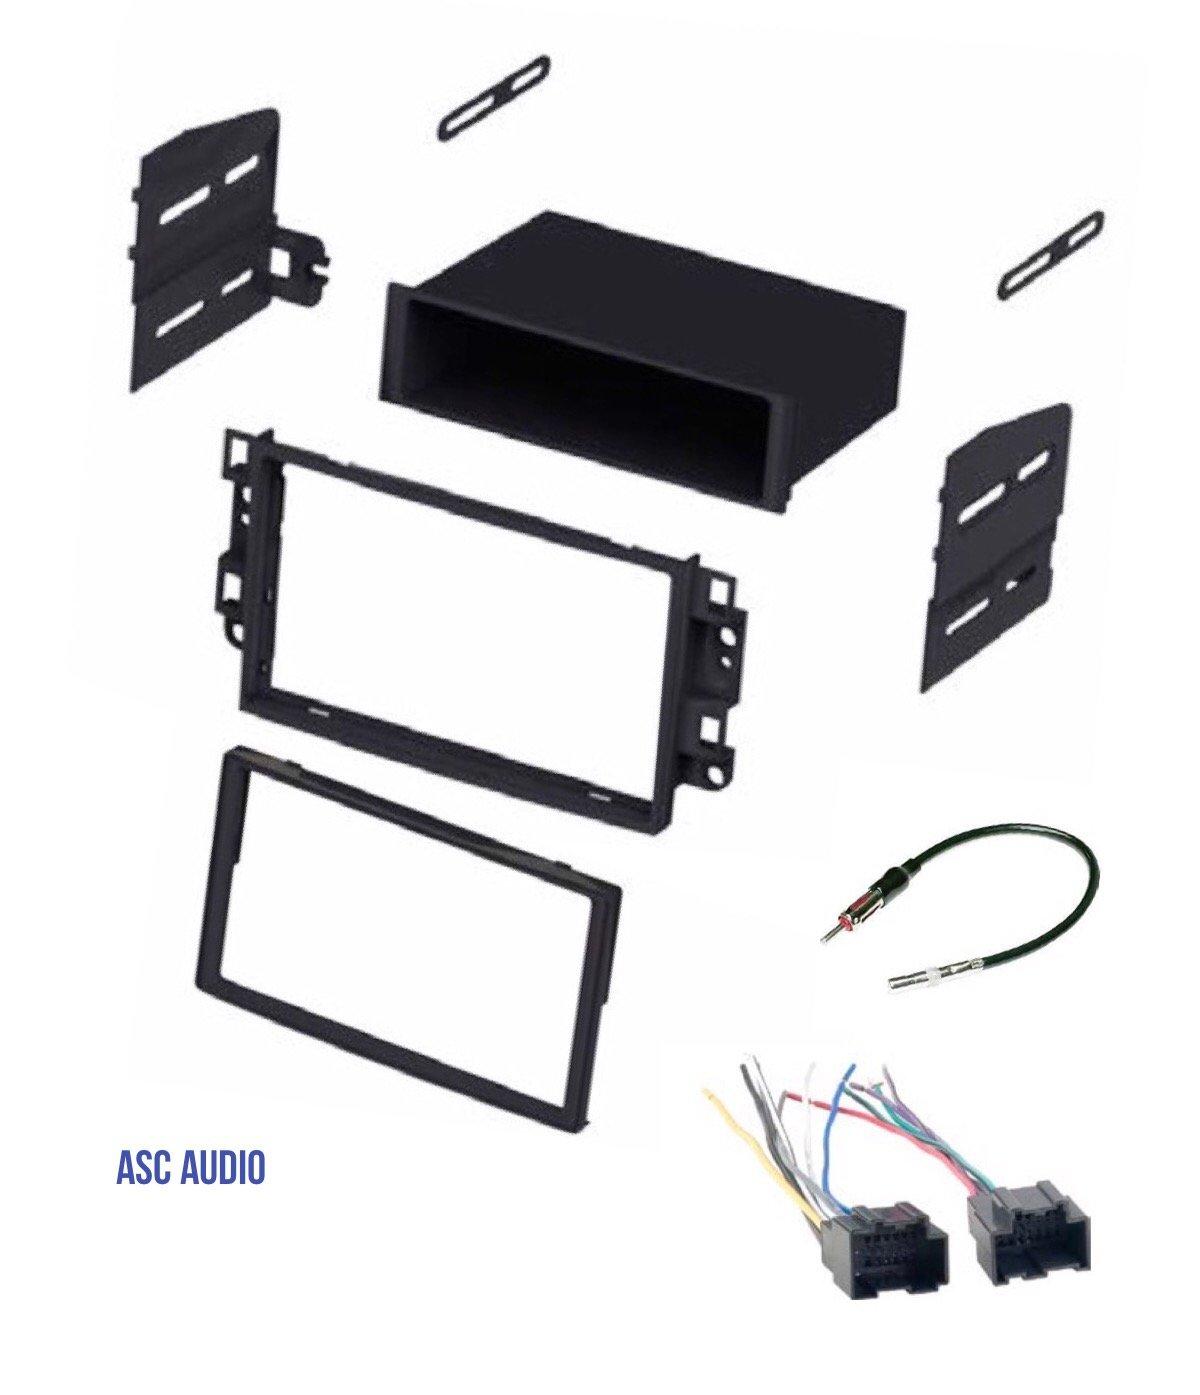 ASC Car Stereo Dash Kit, Wire Harness, Antenna Adapter to Install Radio for some Pontiac G3 (2007-2009 Sedan Only) - Chevrolet Aveo (2007 2008 Sedan Only)- Chevrolet Aveo (2009 2010 2011 All)